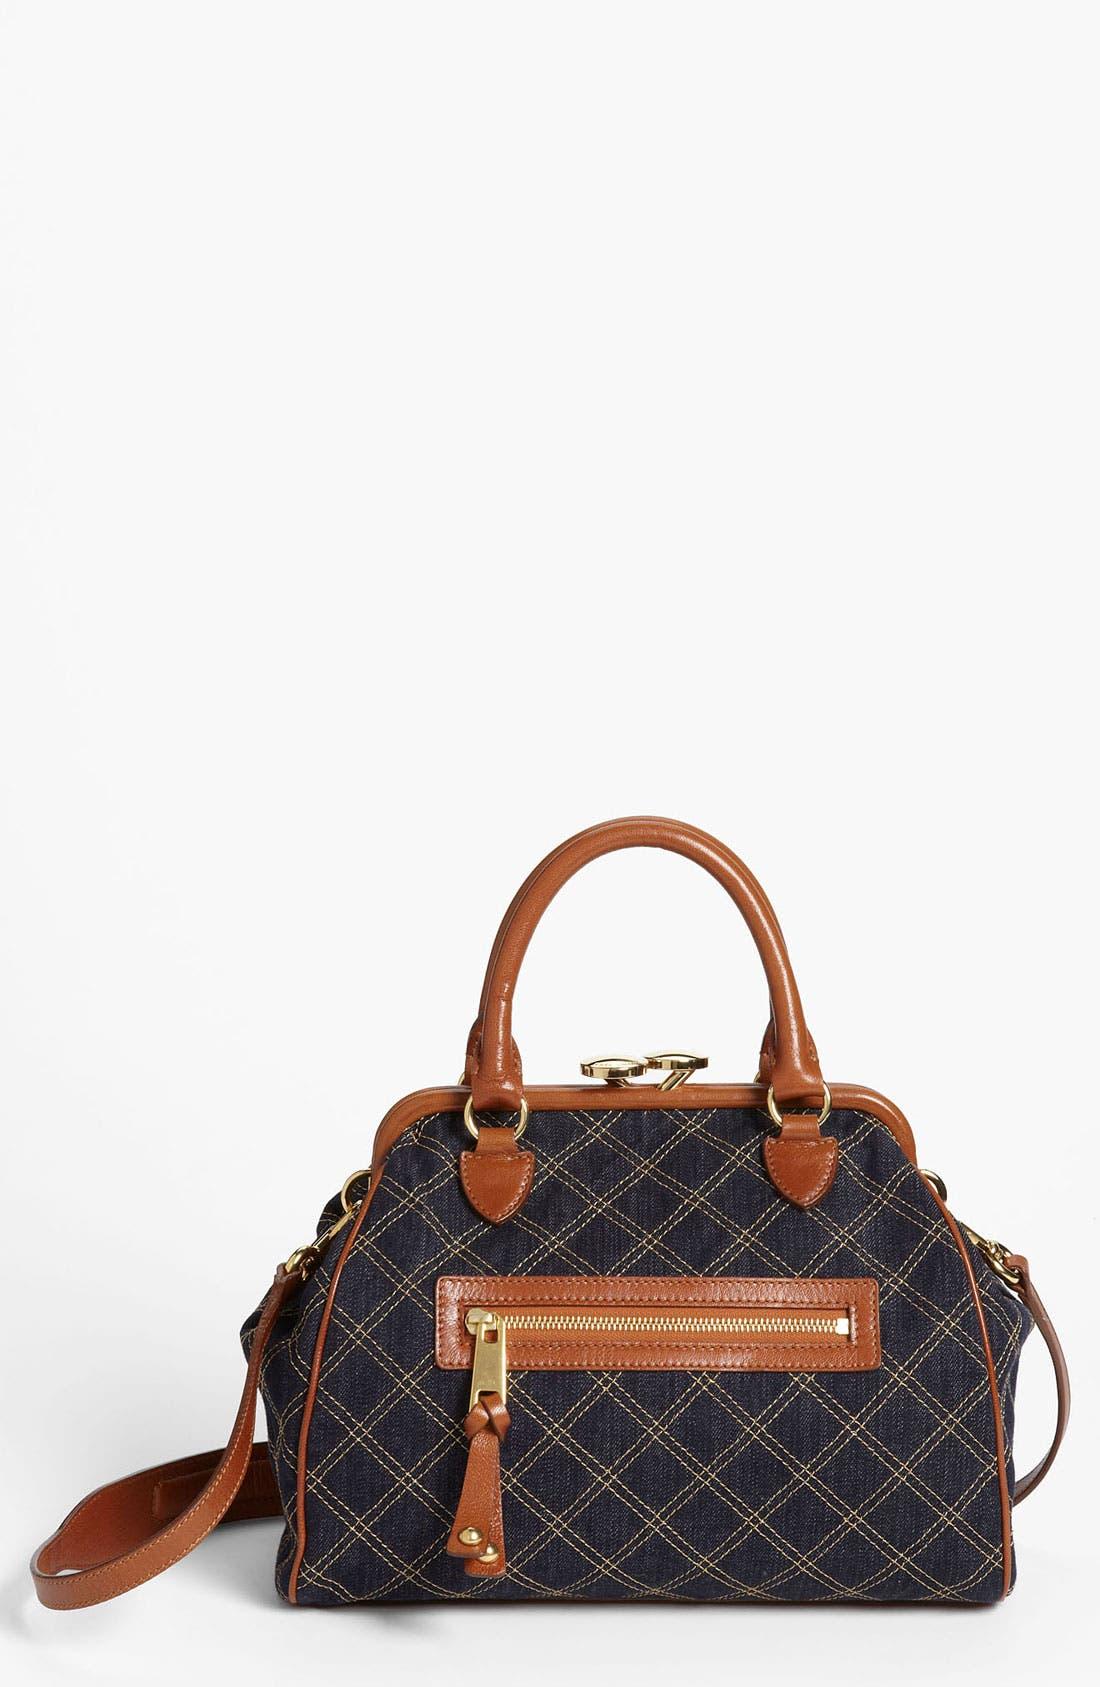 Main Image - MARC JACOBS 'Mini Denim' Stam Bag